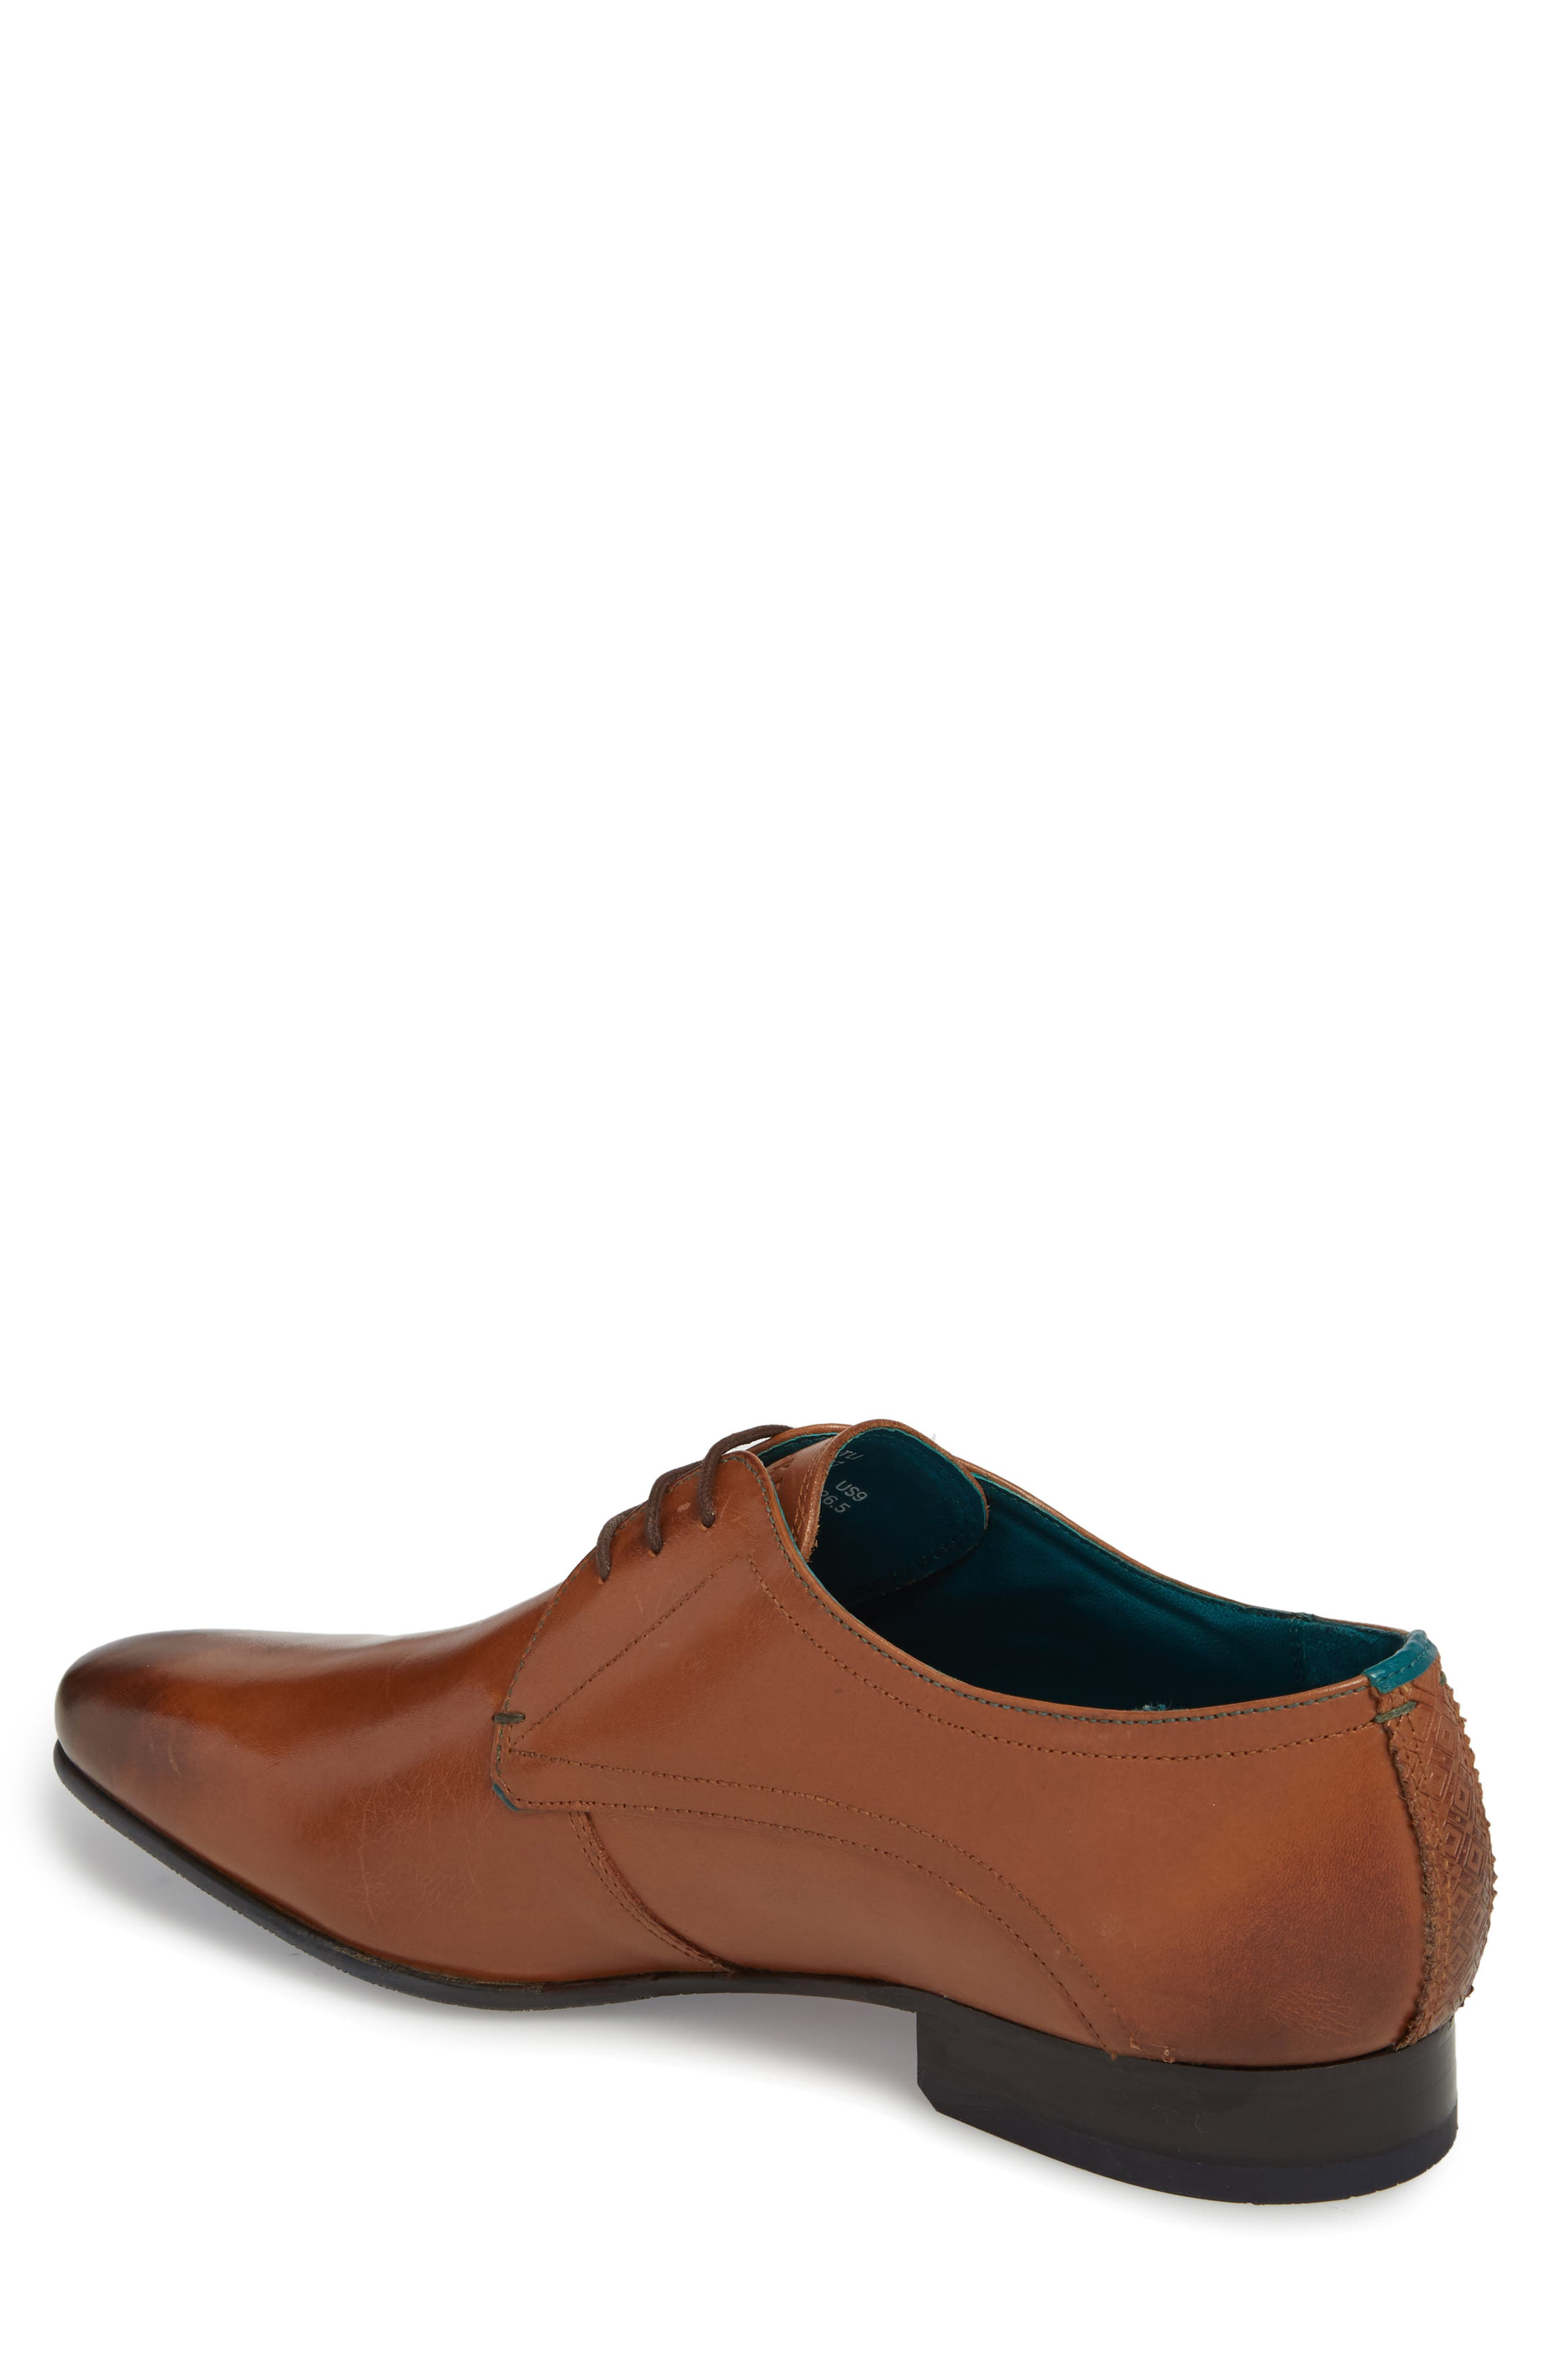 Bhartli Plain Toe Derby,                             Alternate thumbnail 2, color,                             Tan Leather